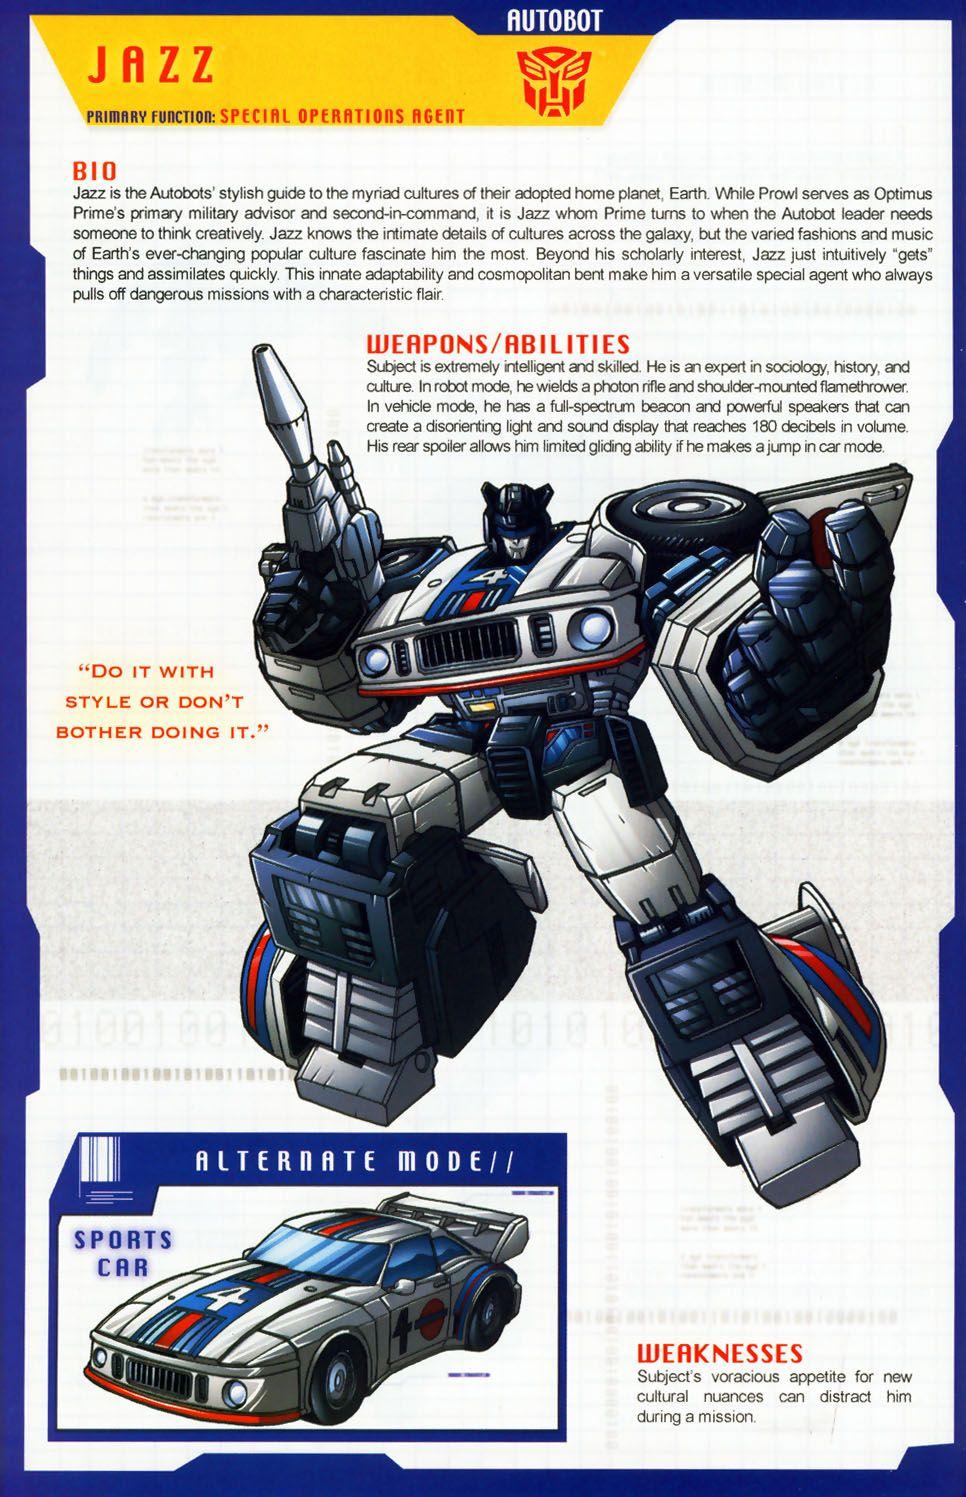 Autobot jazz bio transformers pinterest